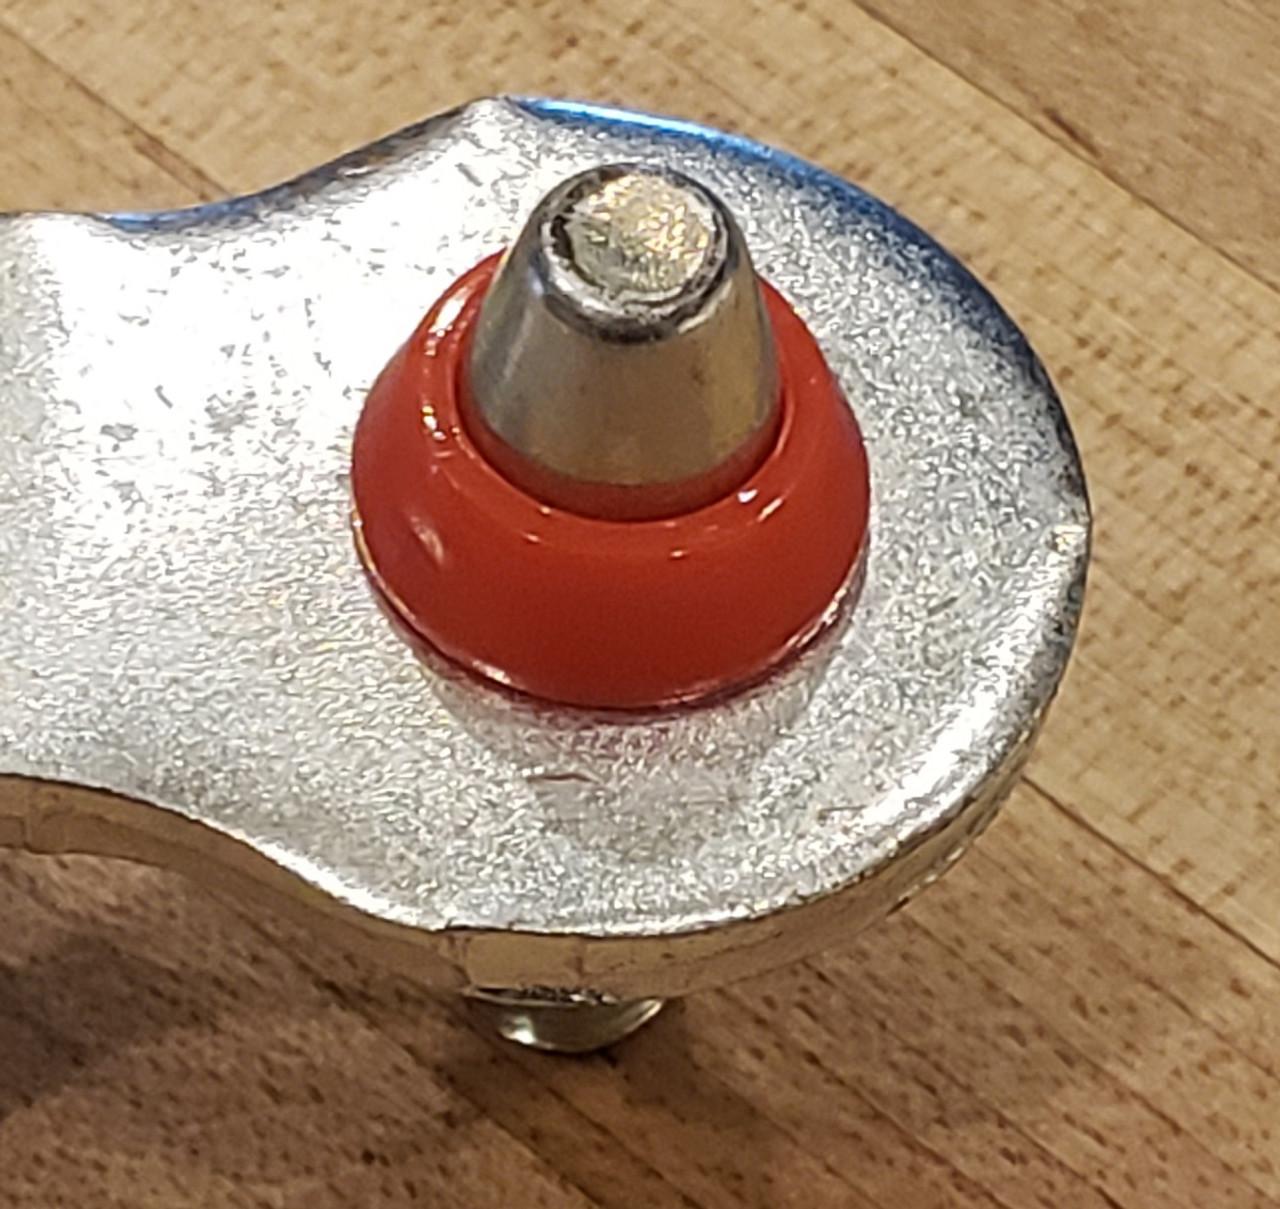 Mercury Montclair FA1KIT™ Transmission Shift Lever / Linkage Replacement Bushing Kit fits onto pin as shown.